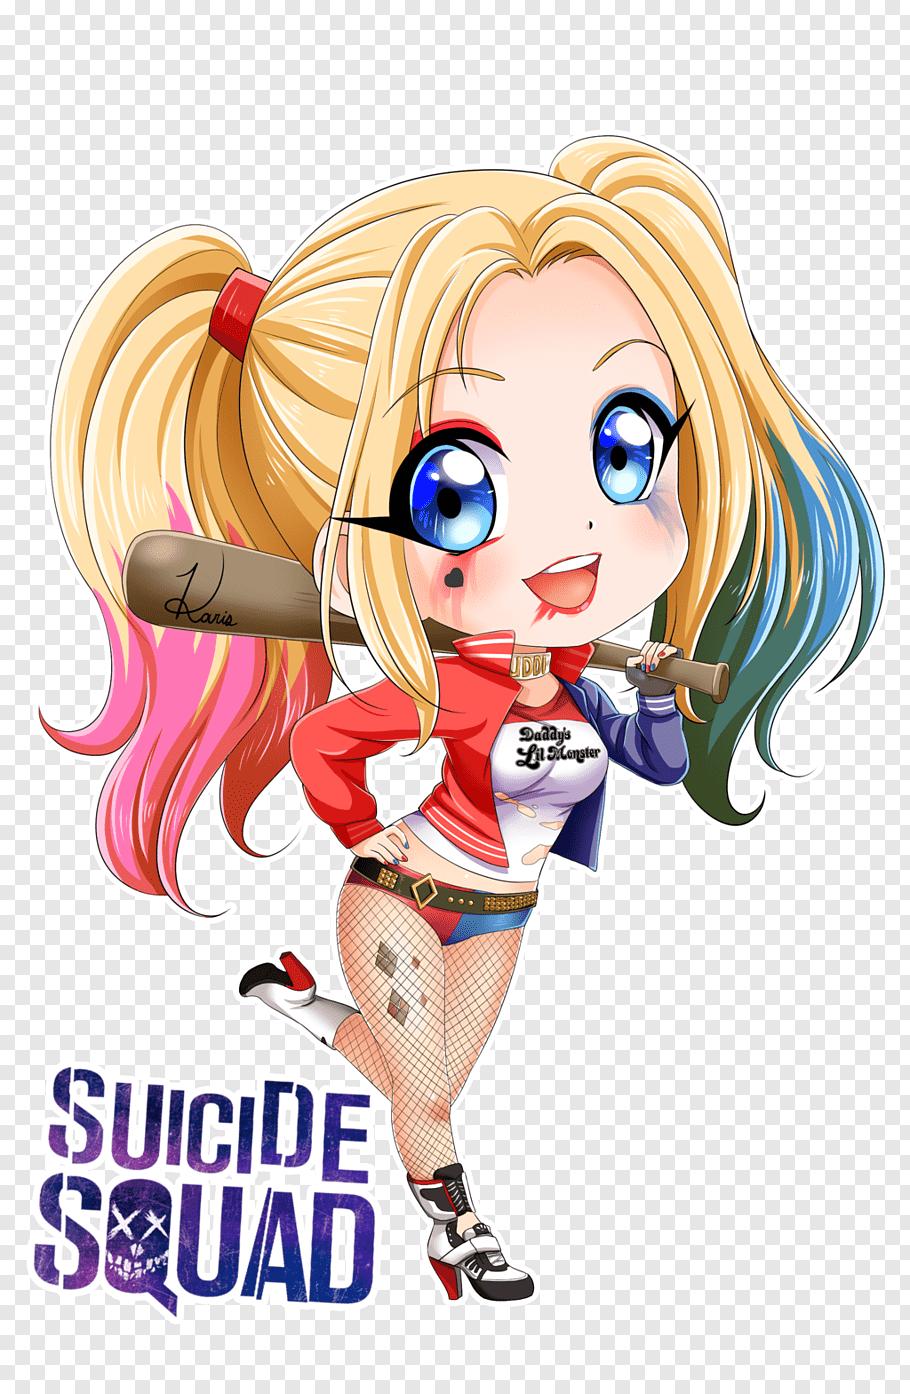 Suicide Squad Harley Quinn, Harley Quinn Joker Batman Poison.